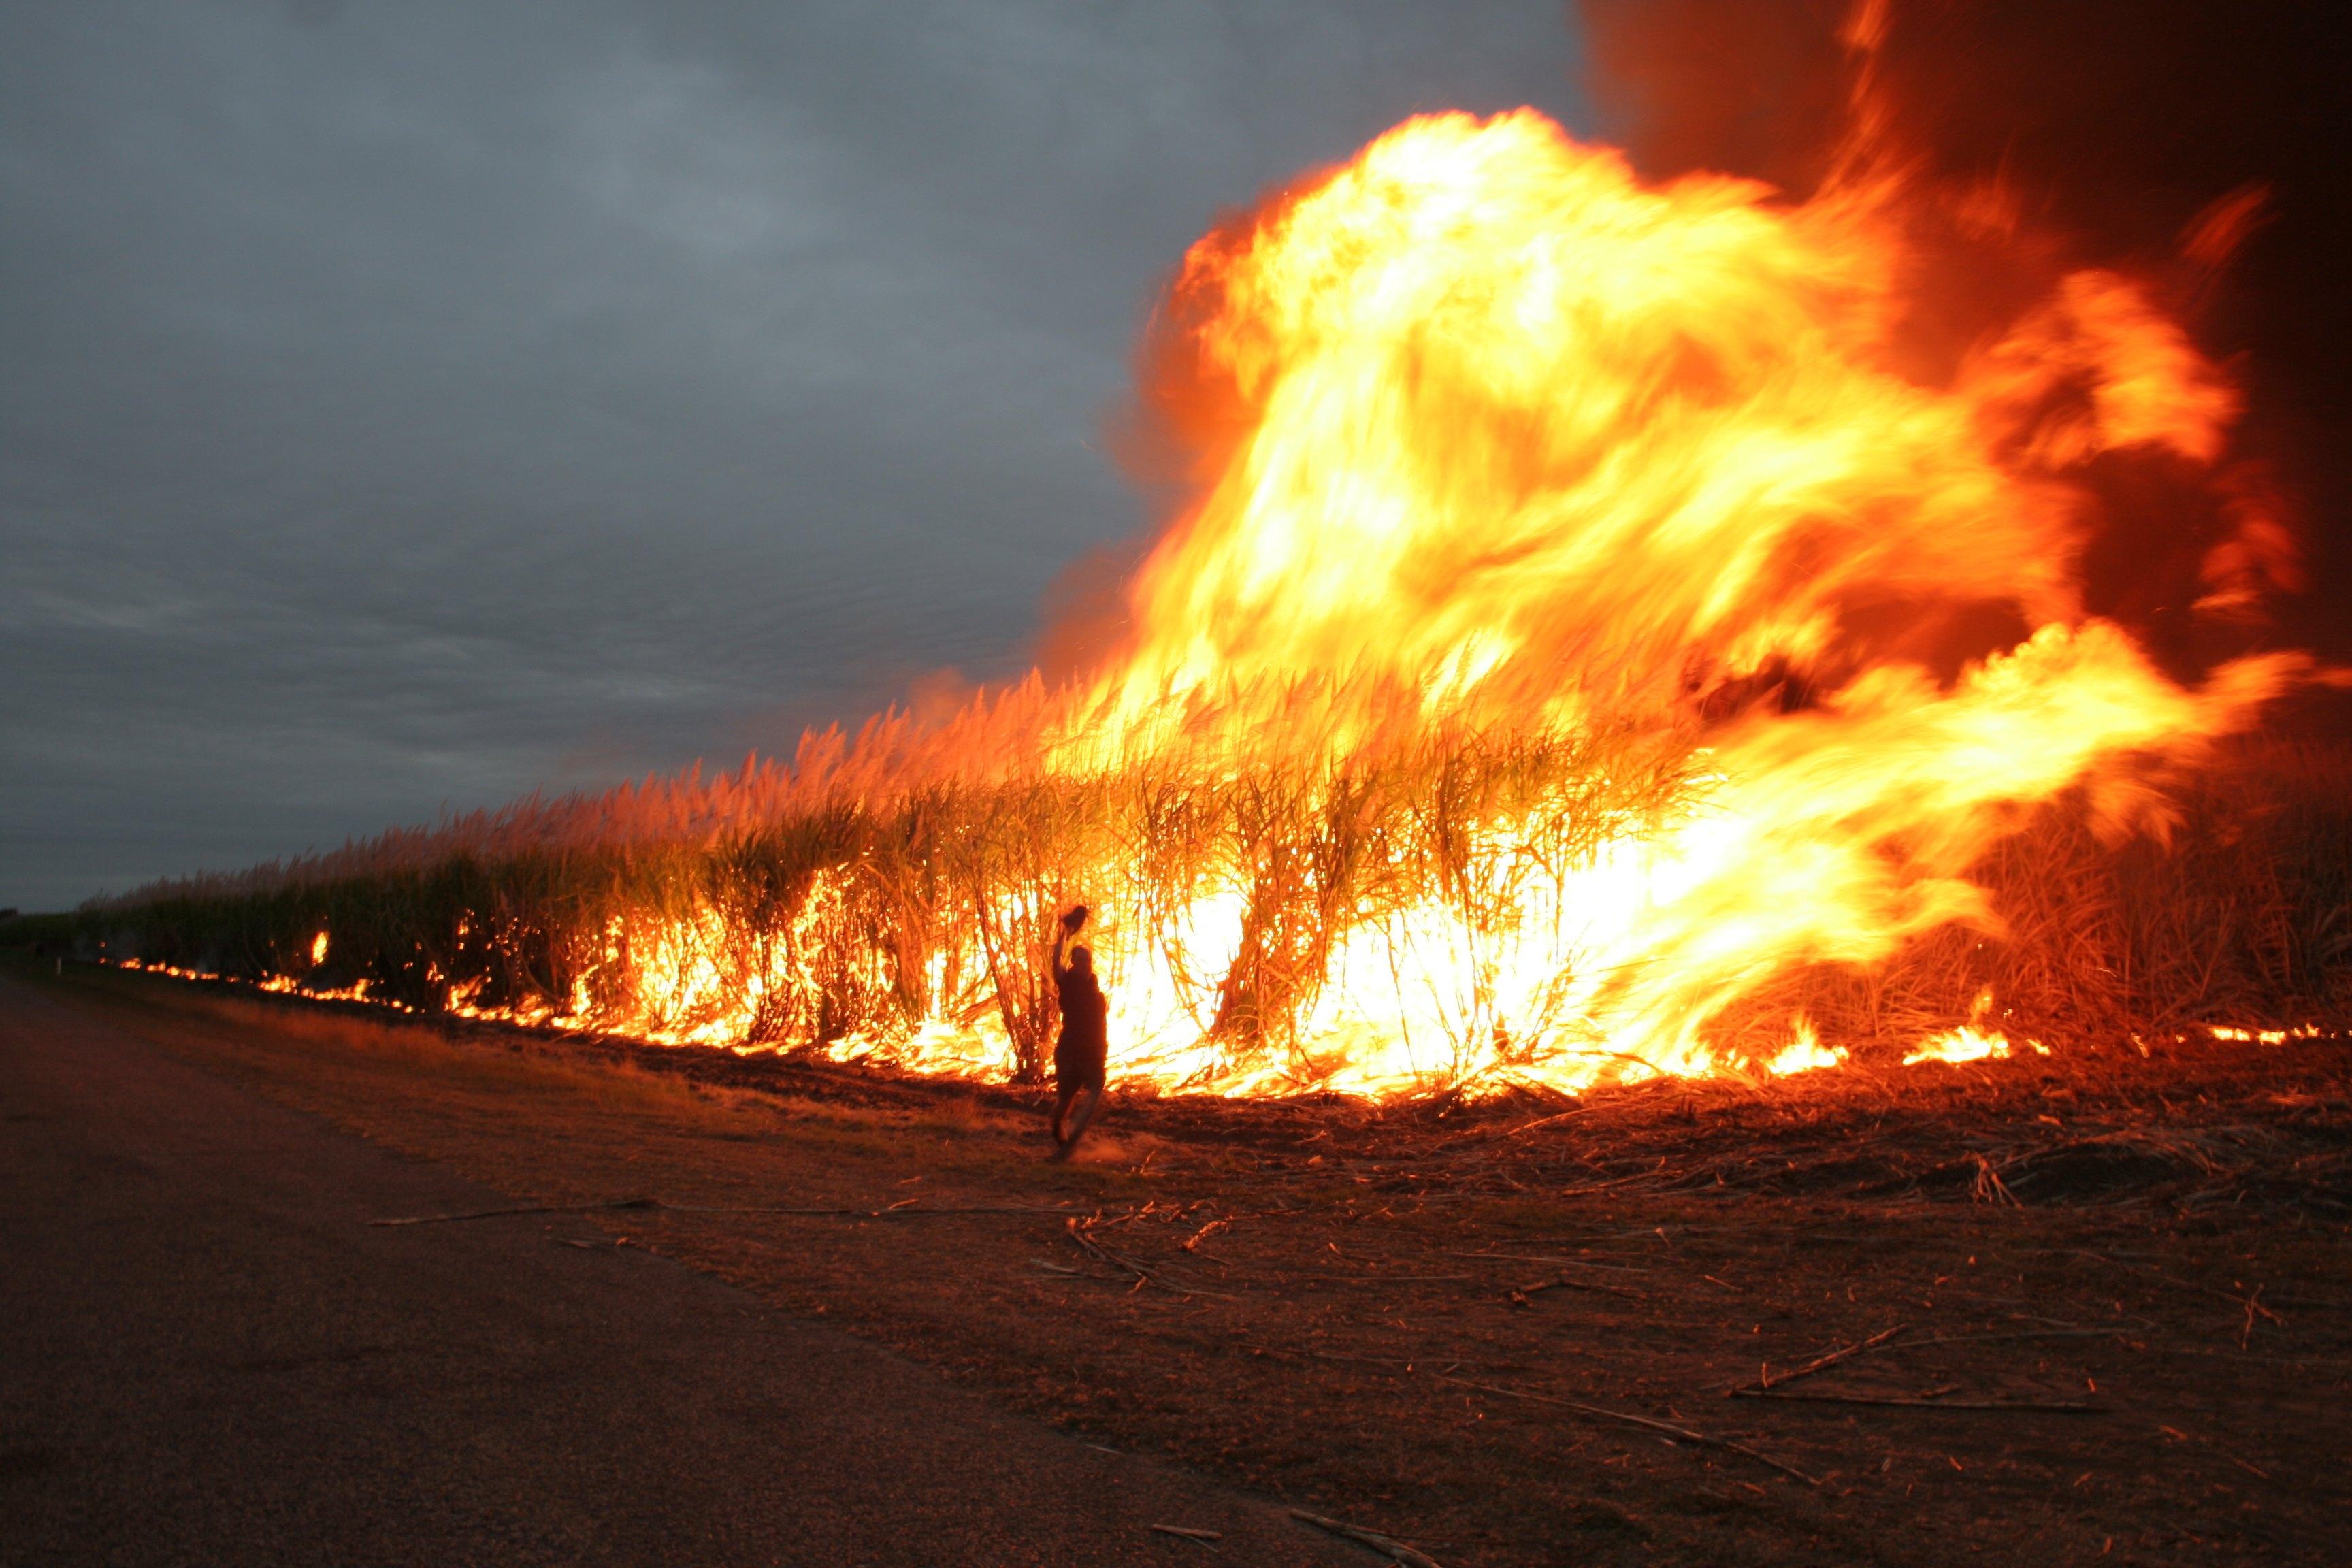 cane_burning.jpg